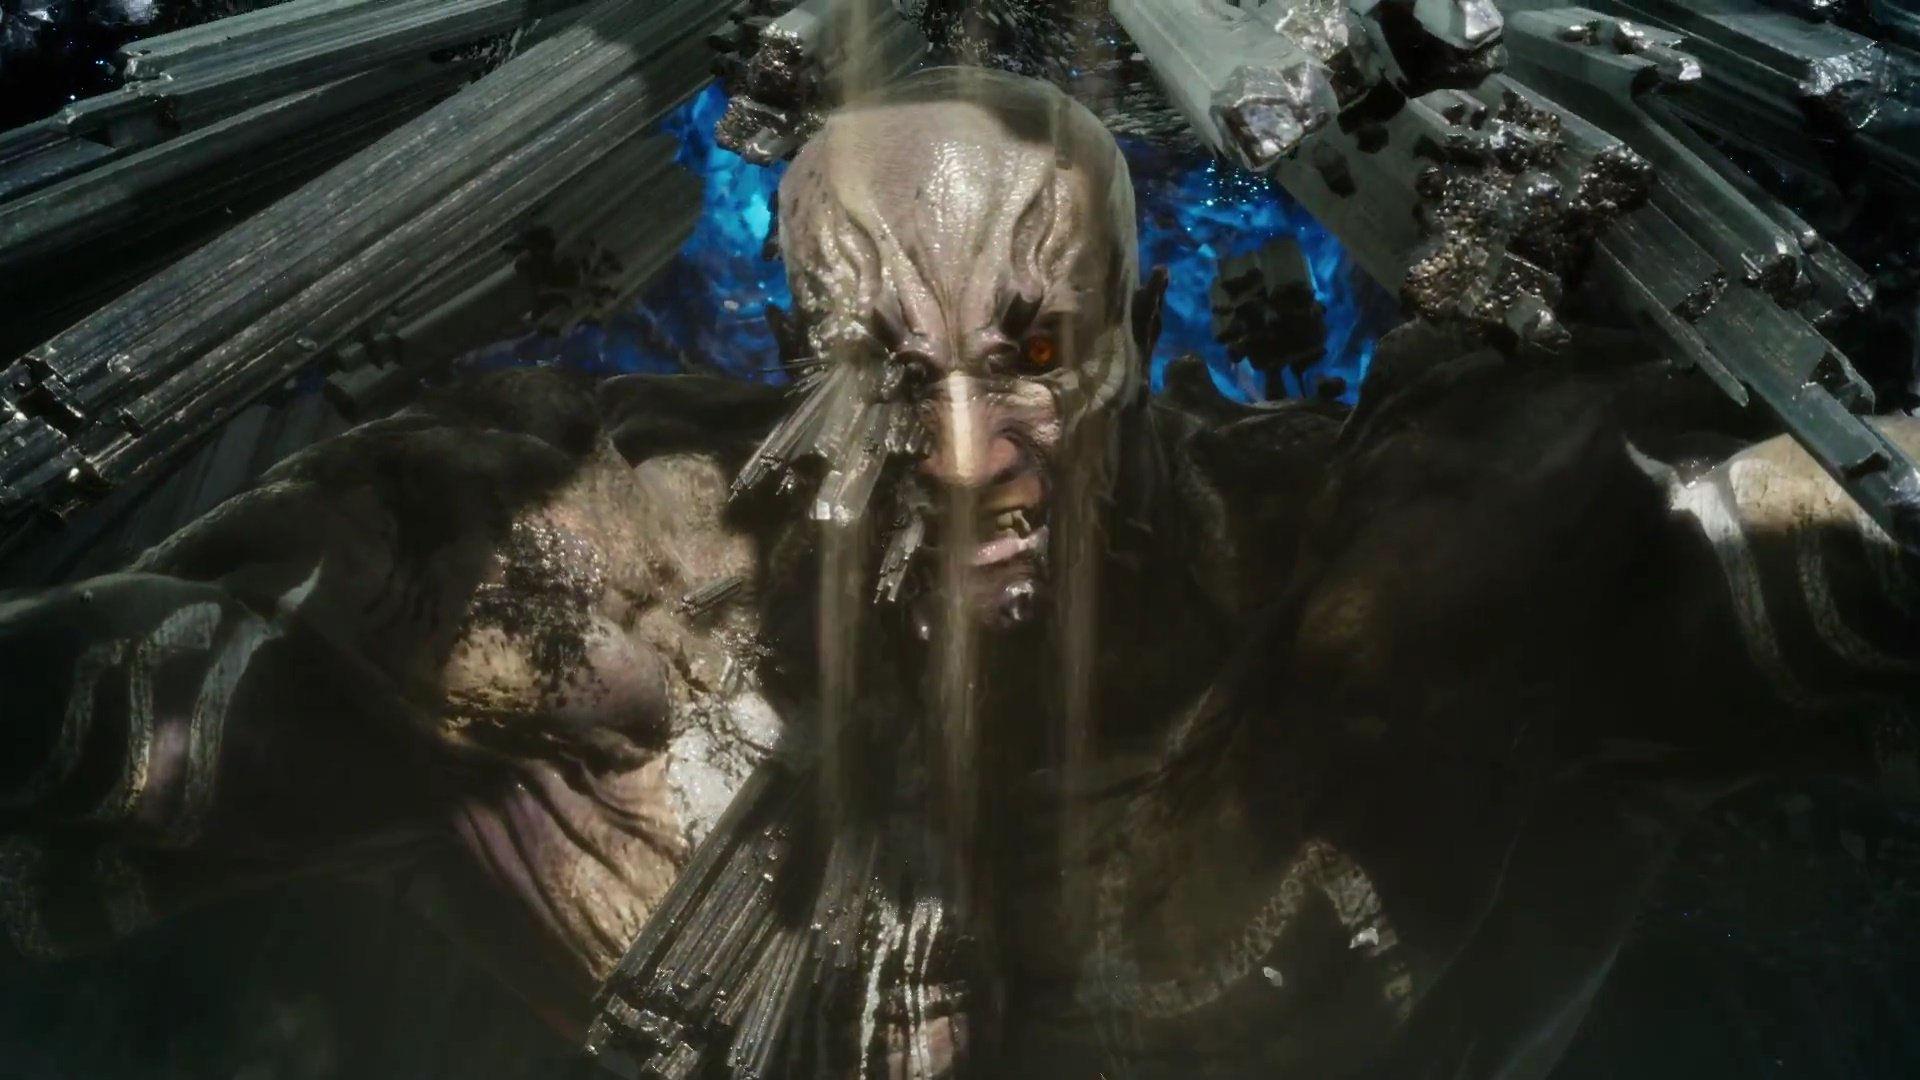 Titan (Final Fantasy XV boss)